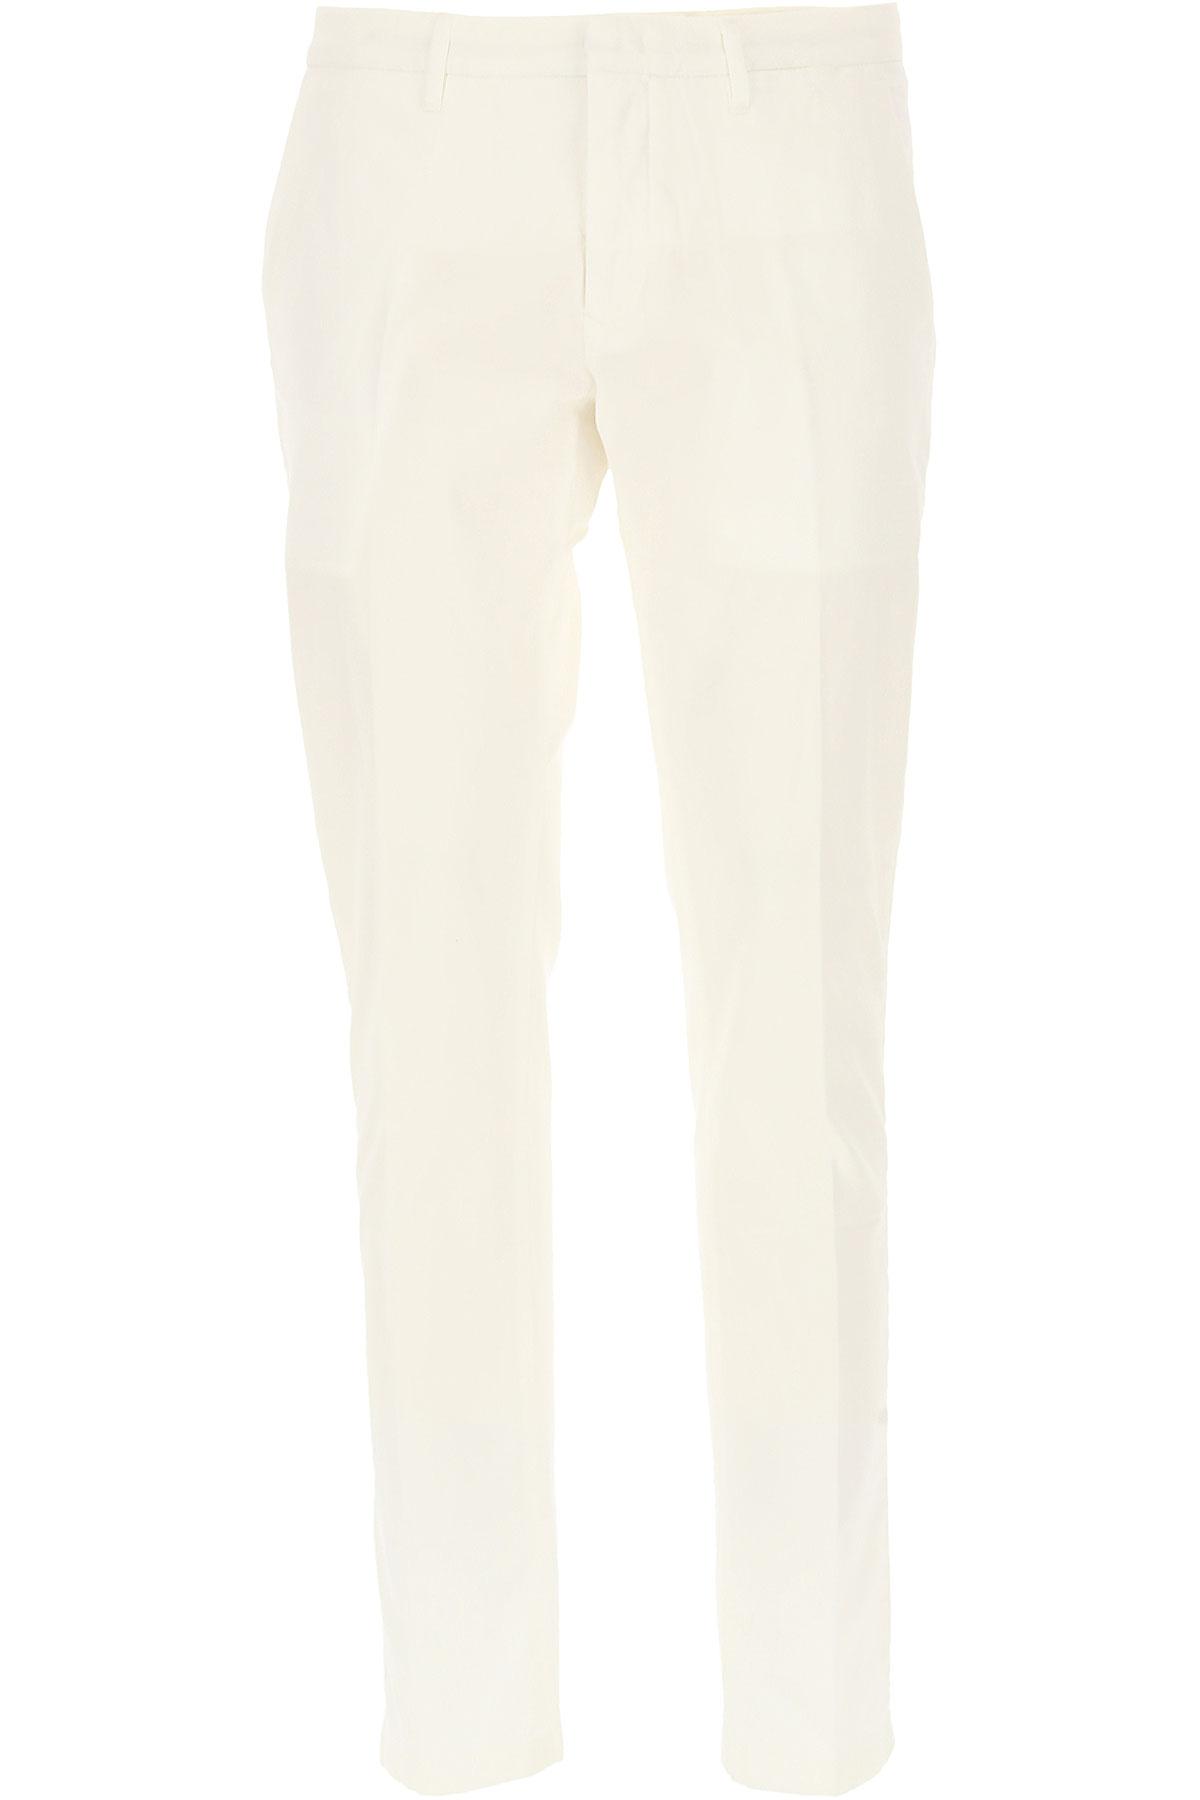 Siviglia Pantalon Homme Pas Cher En Soldes, Blanc, Coton, 2019, 50 51 52 54